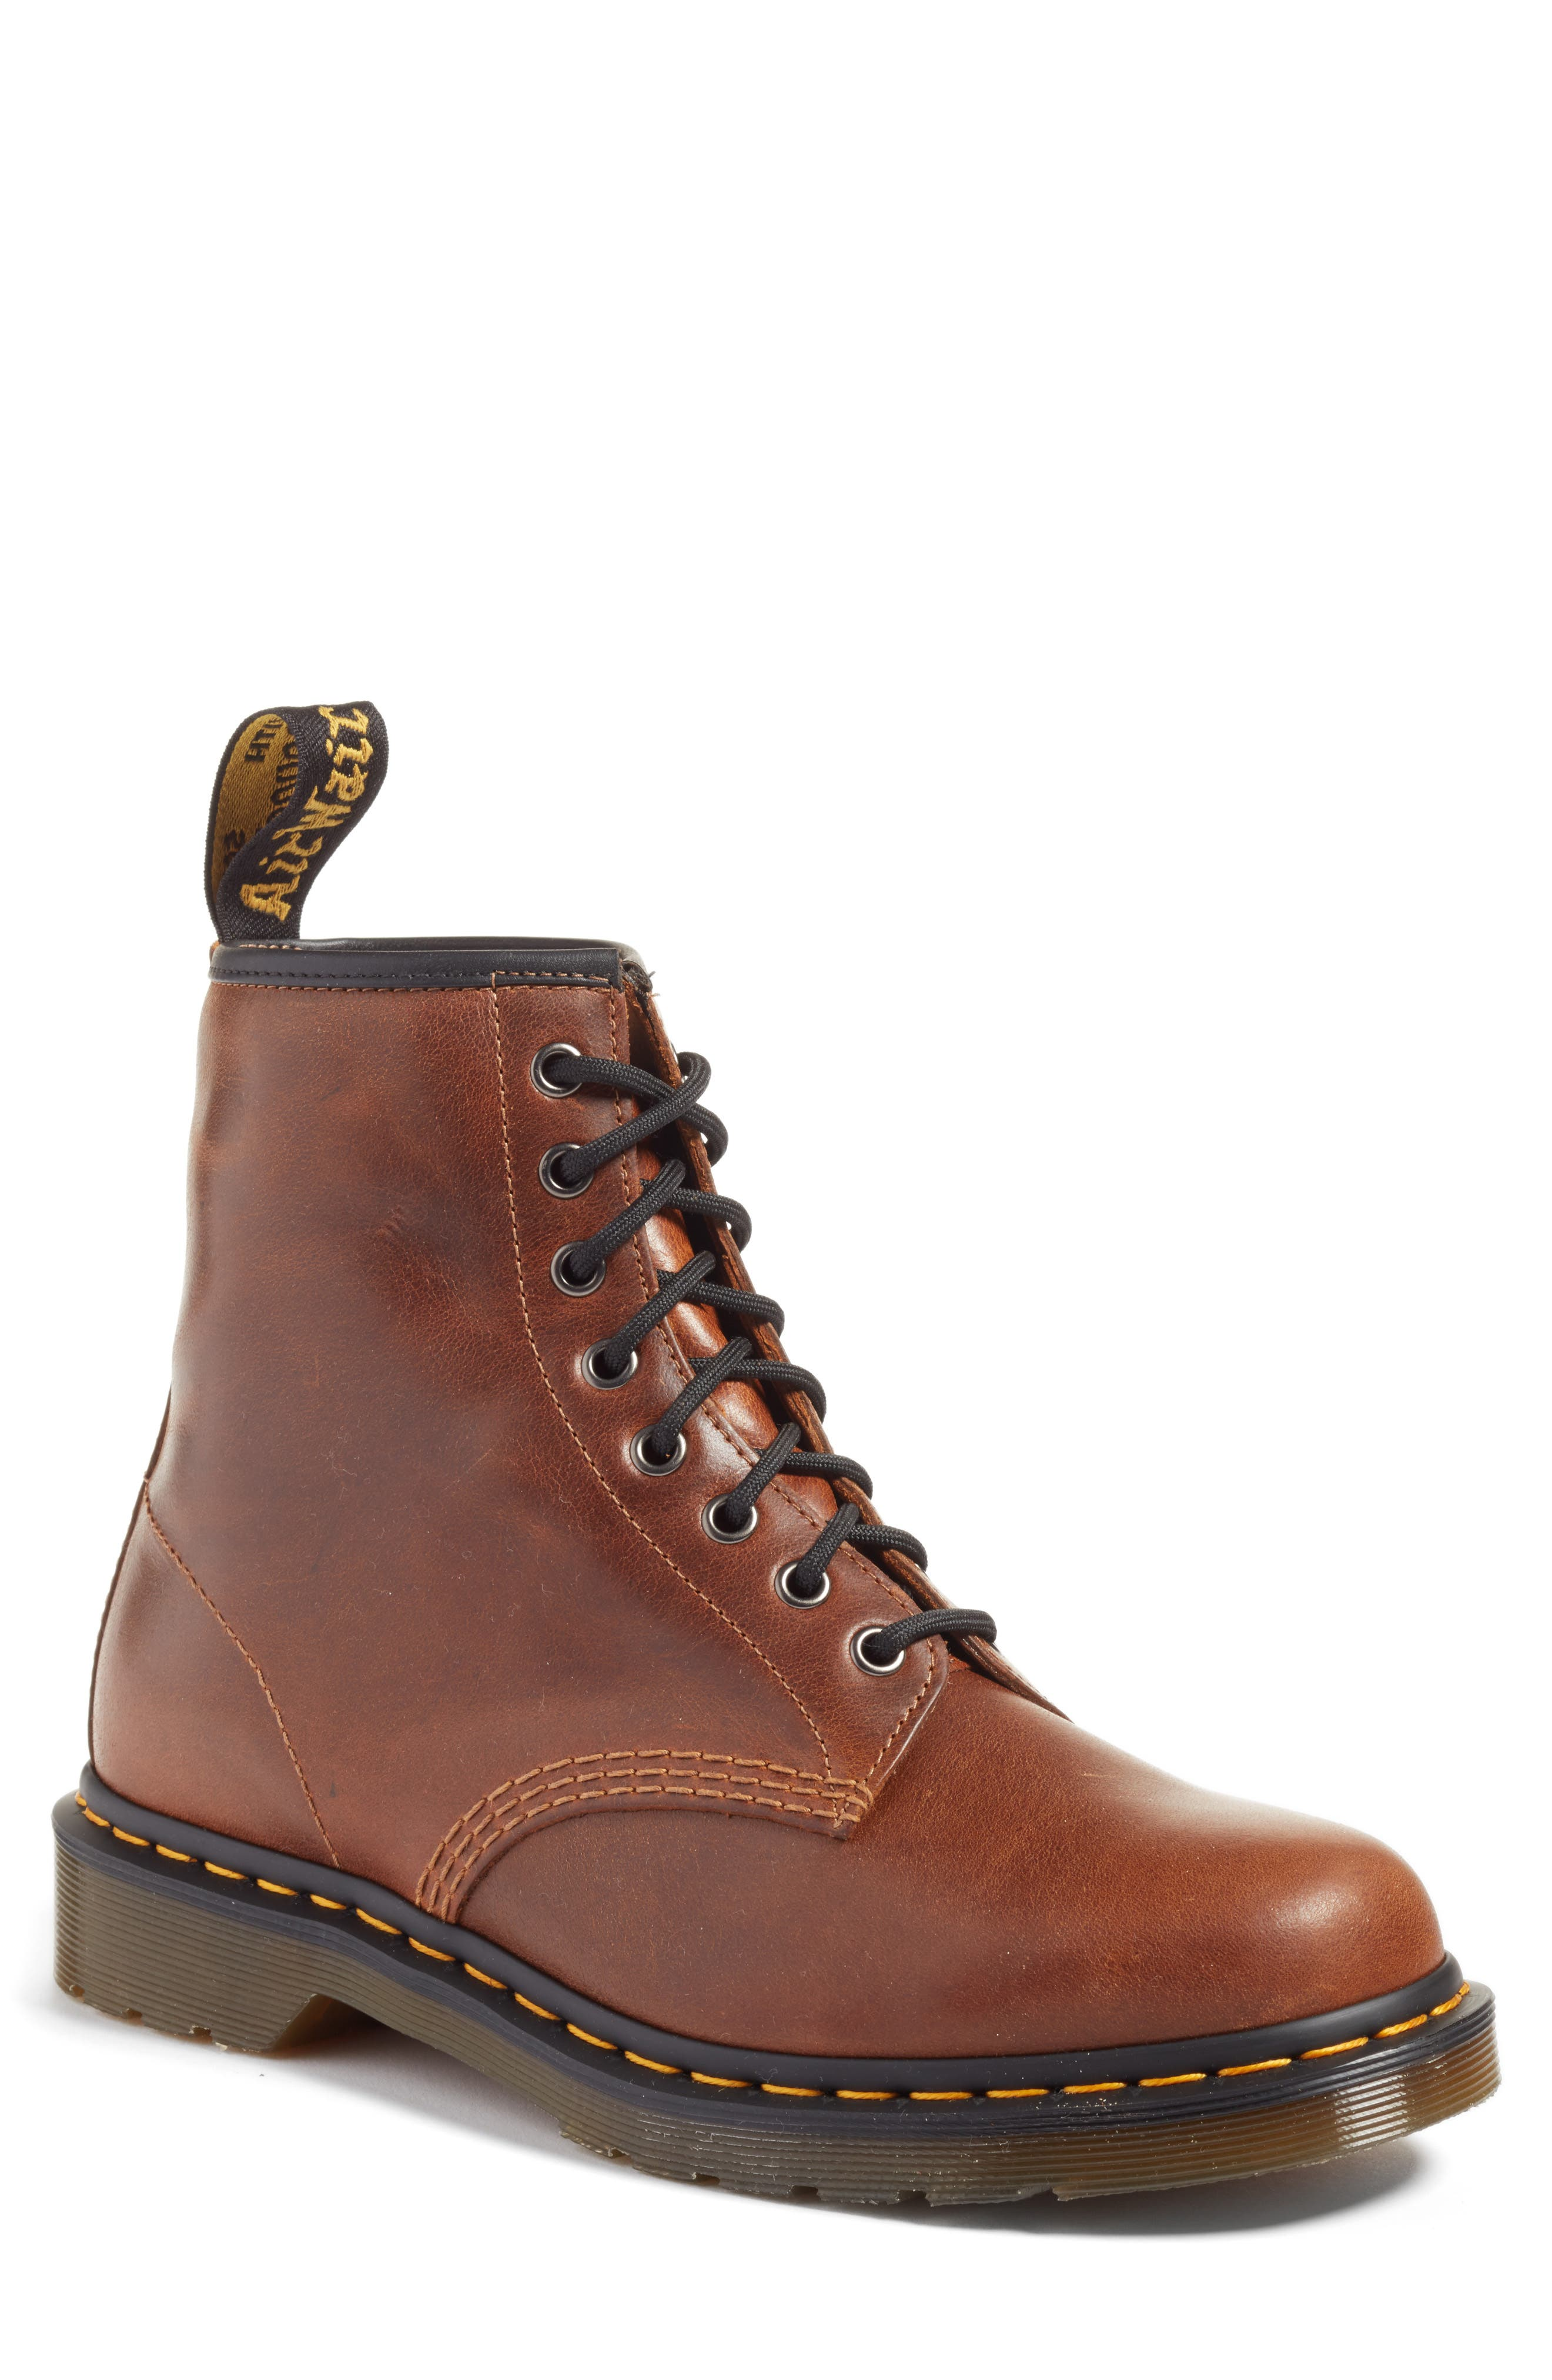 '1460' Boot,                             Main thumbnail 1, color,                             Butterscotch